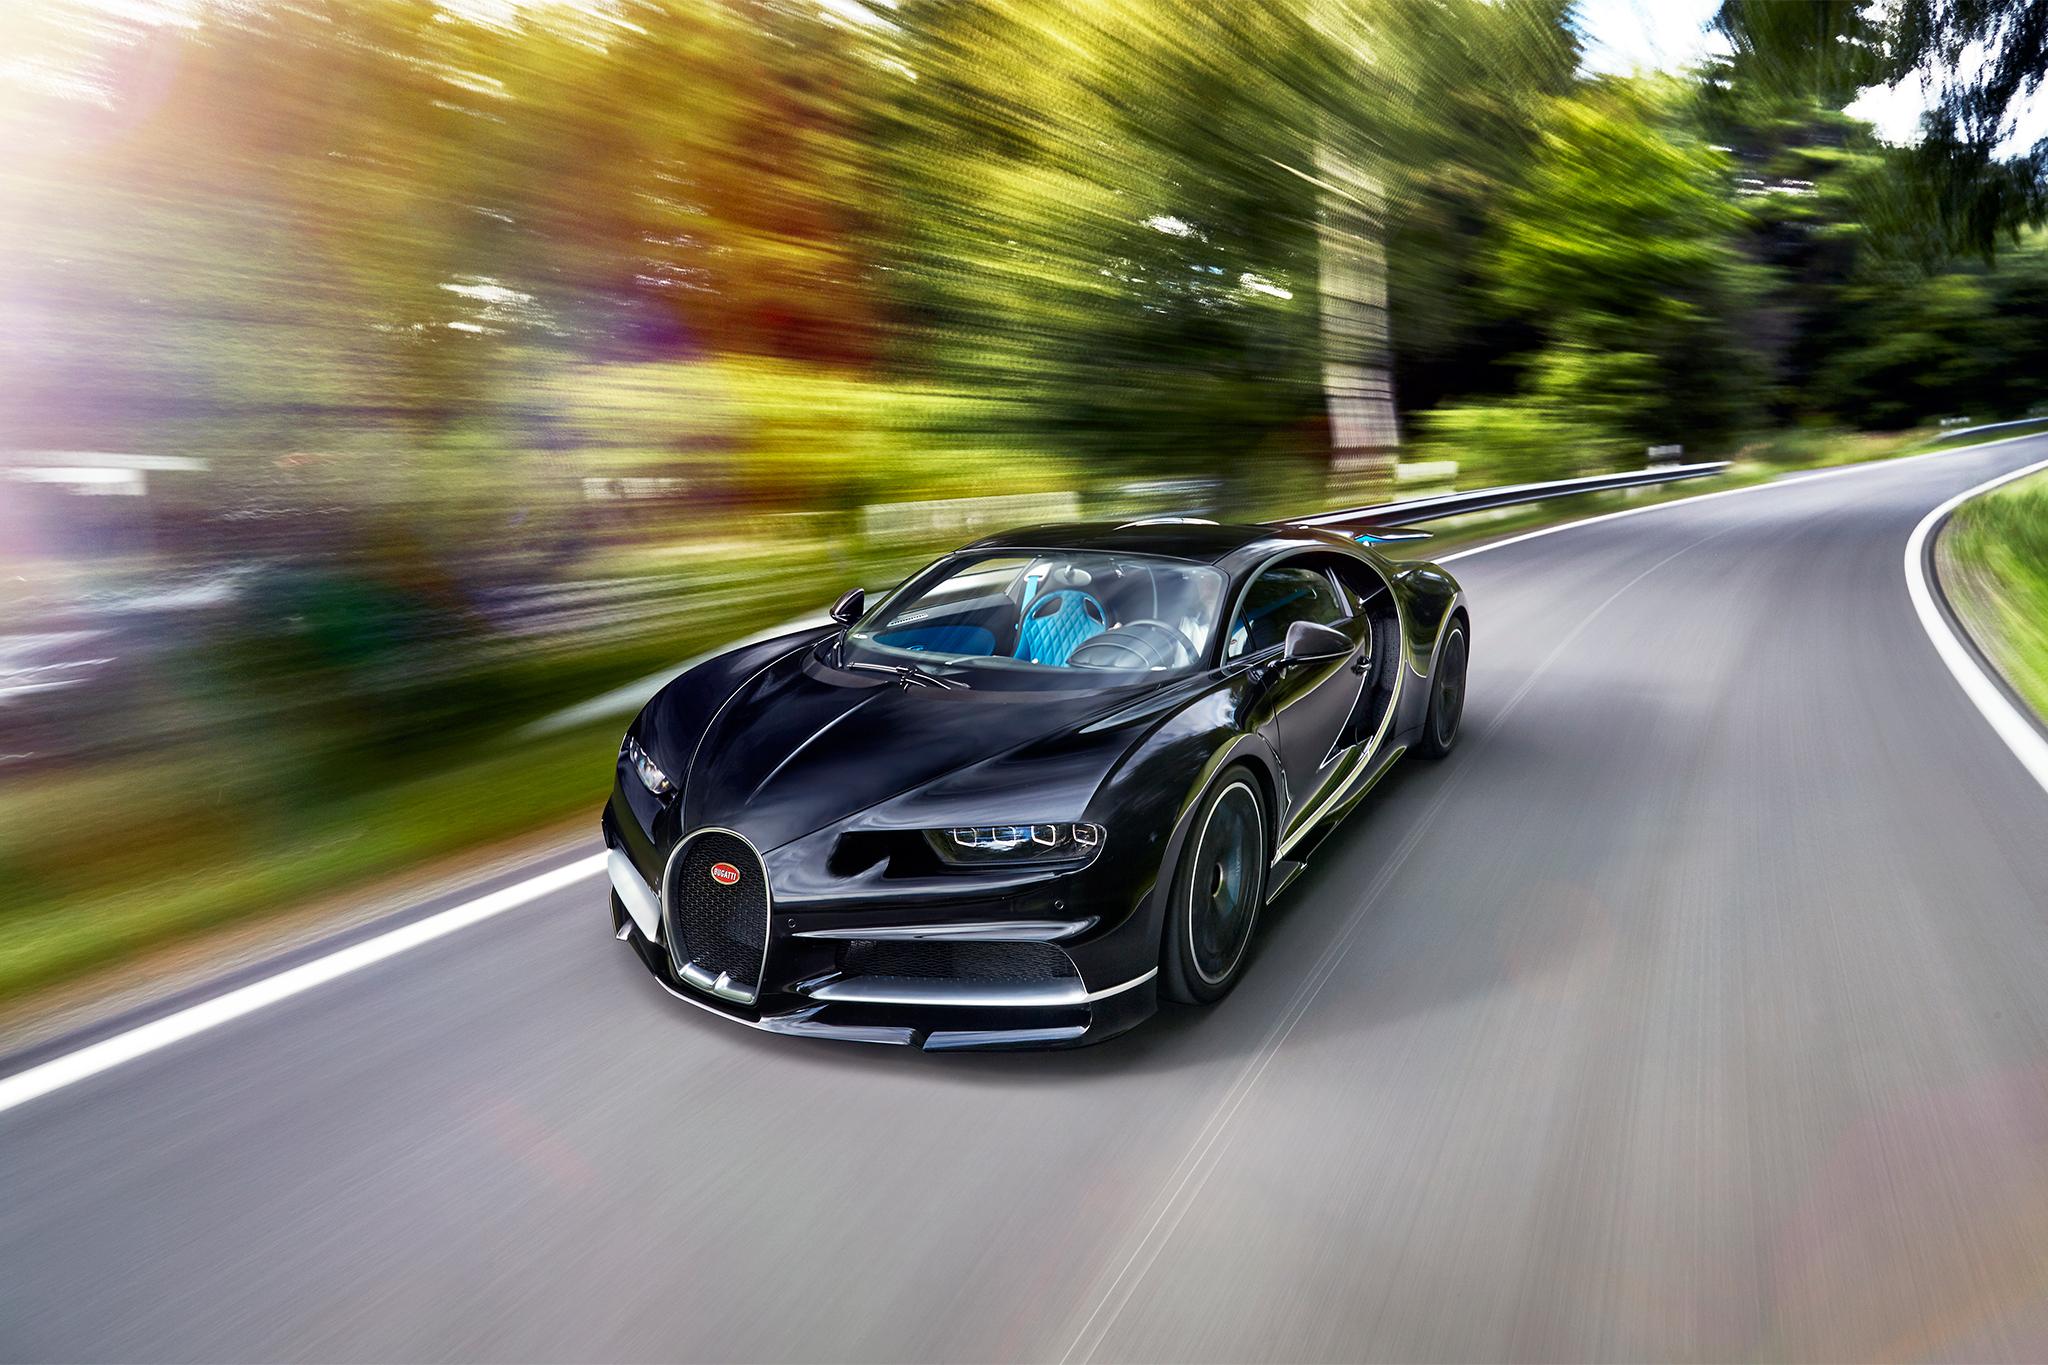 rome rental macan car hire rent sport luxury turbo ferrari porsche aaa